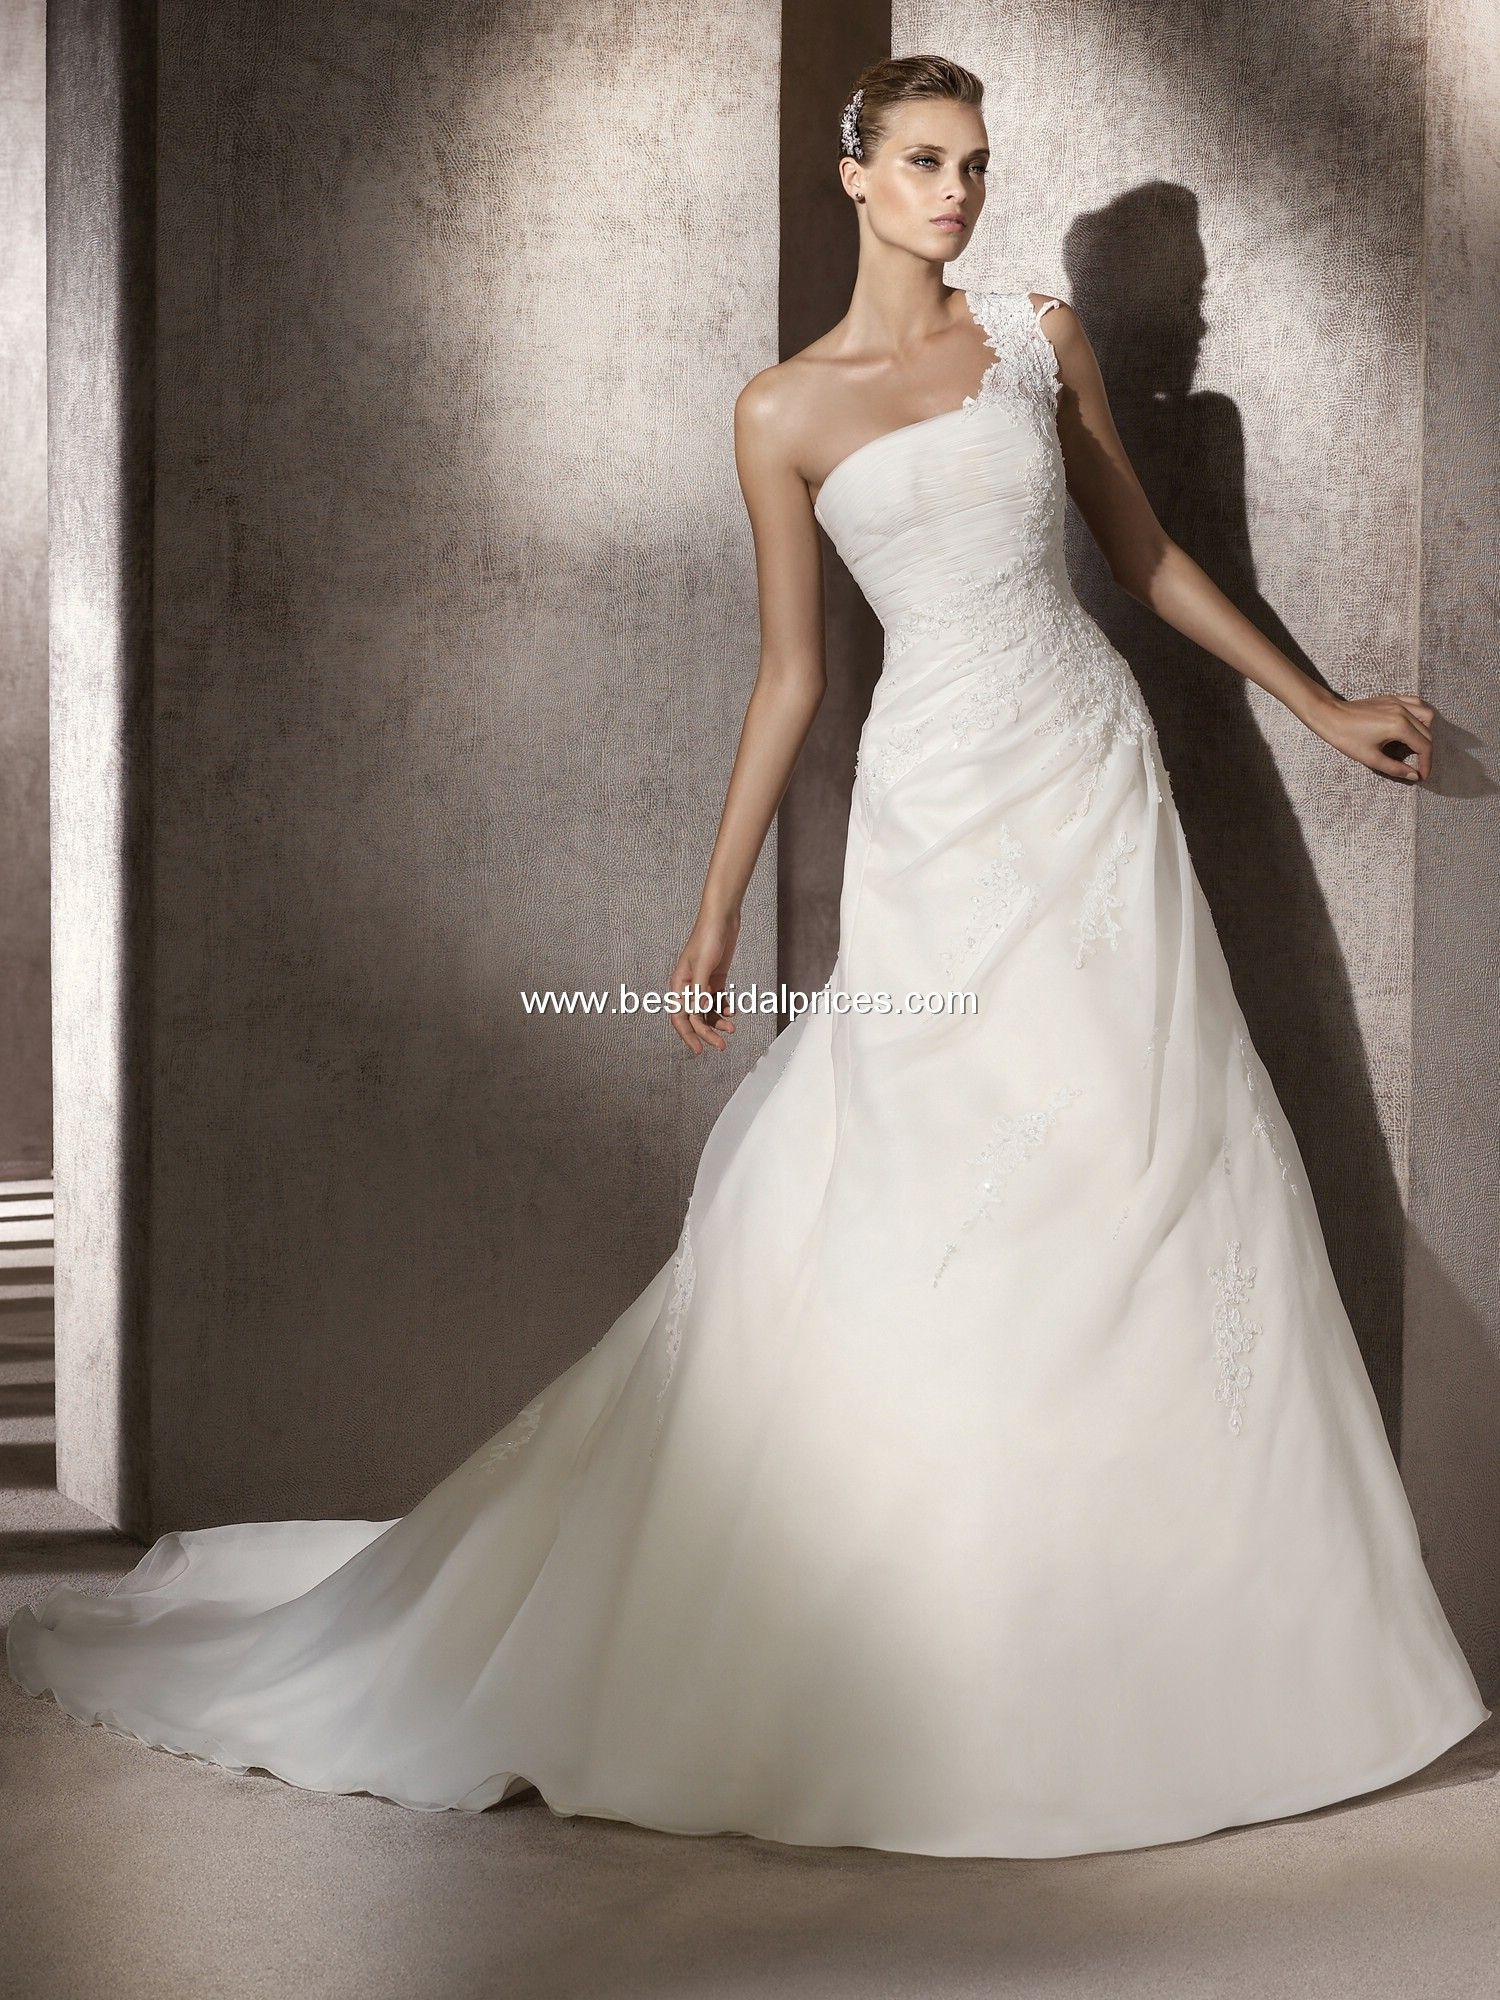 Pronovias wedding dresses style albeniz wedding dresses izabella bridal boutique toronto mississauga bridal gowns and designer wedding dresses bridesmaids dresses mothers and evening dresses and a ombrellifo Images